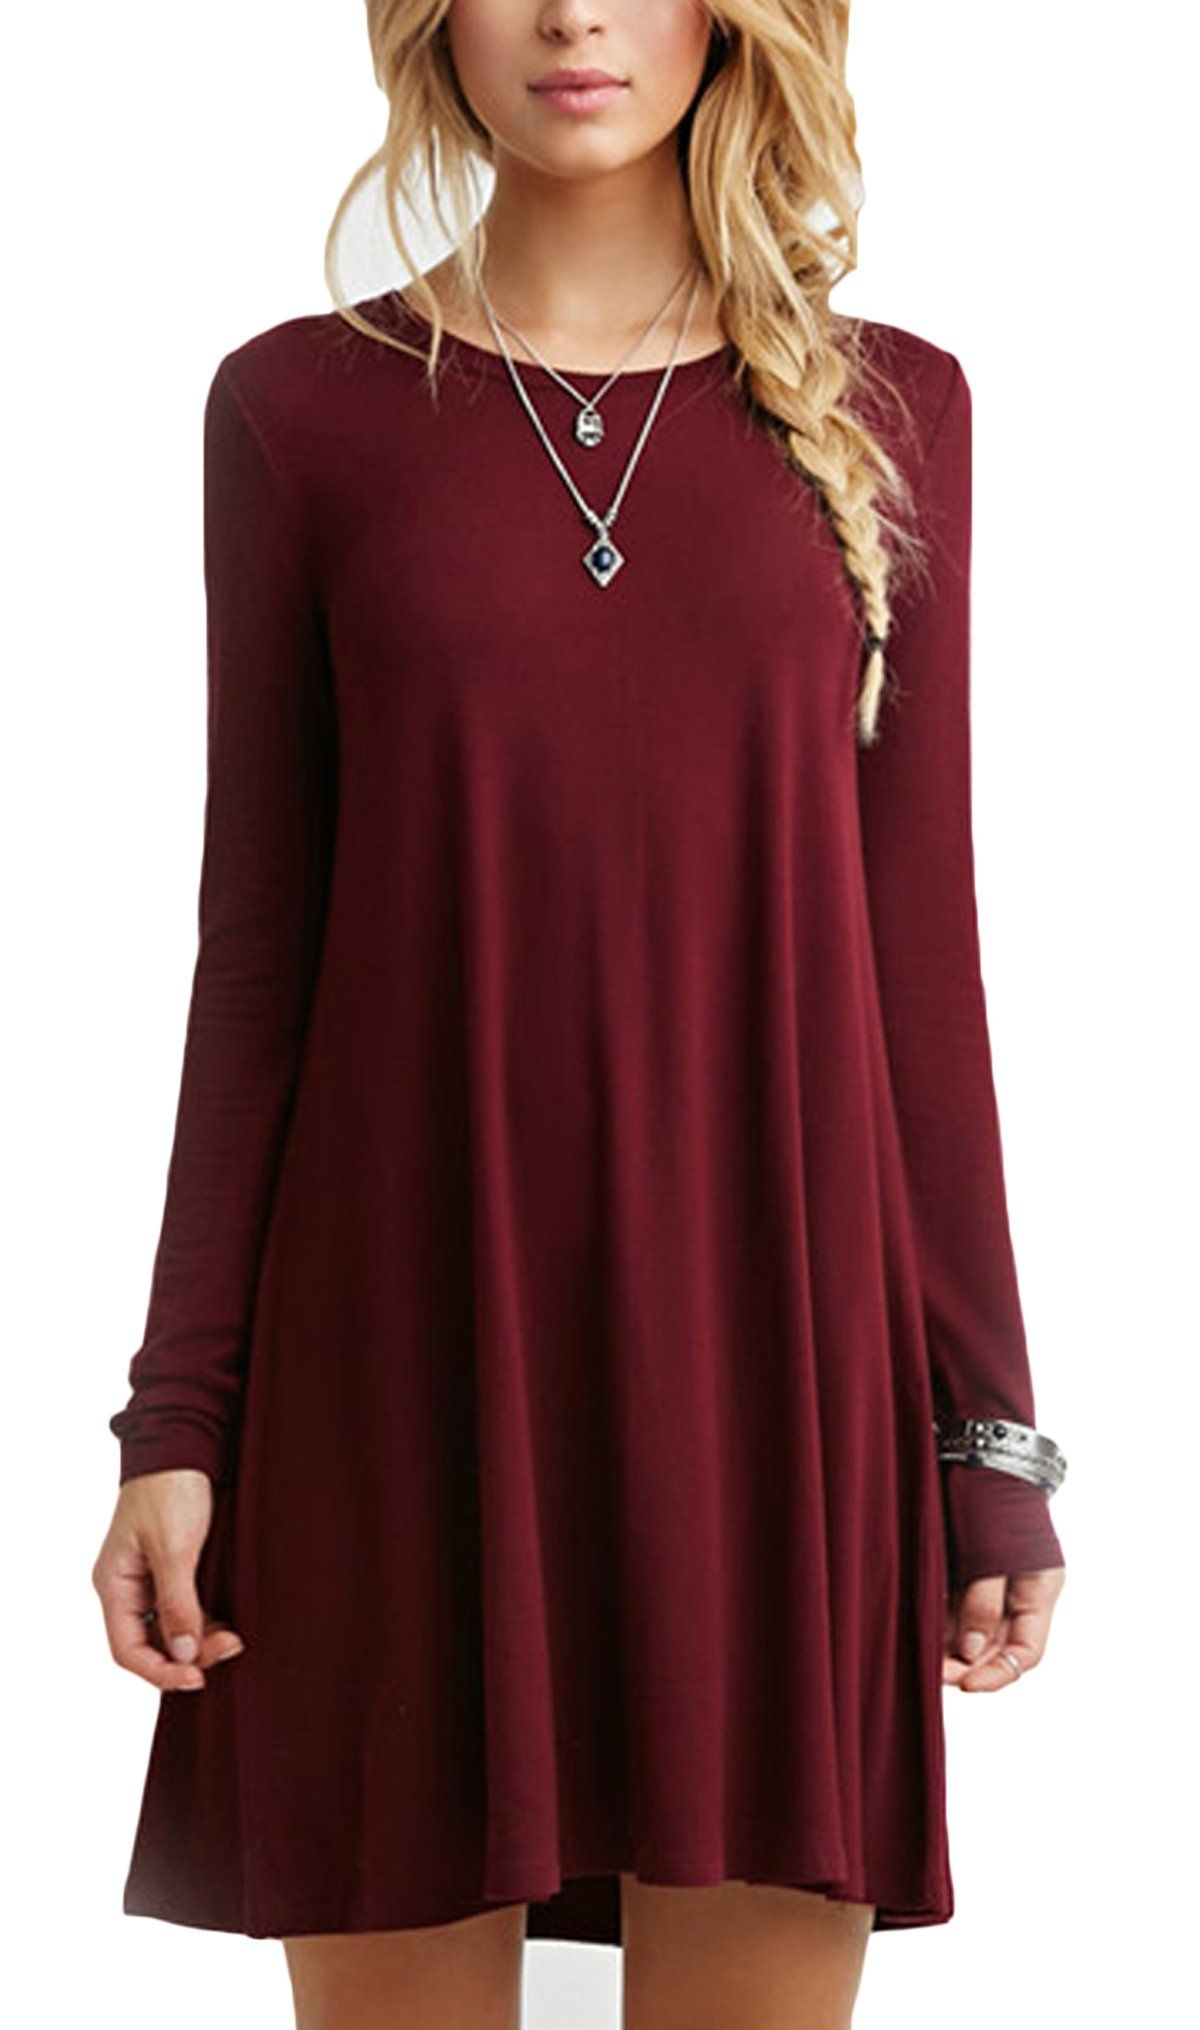 Shein womenus wine red oxblood long sleeve casual babydoll dress xs